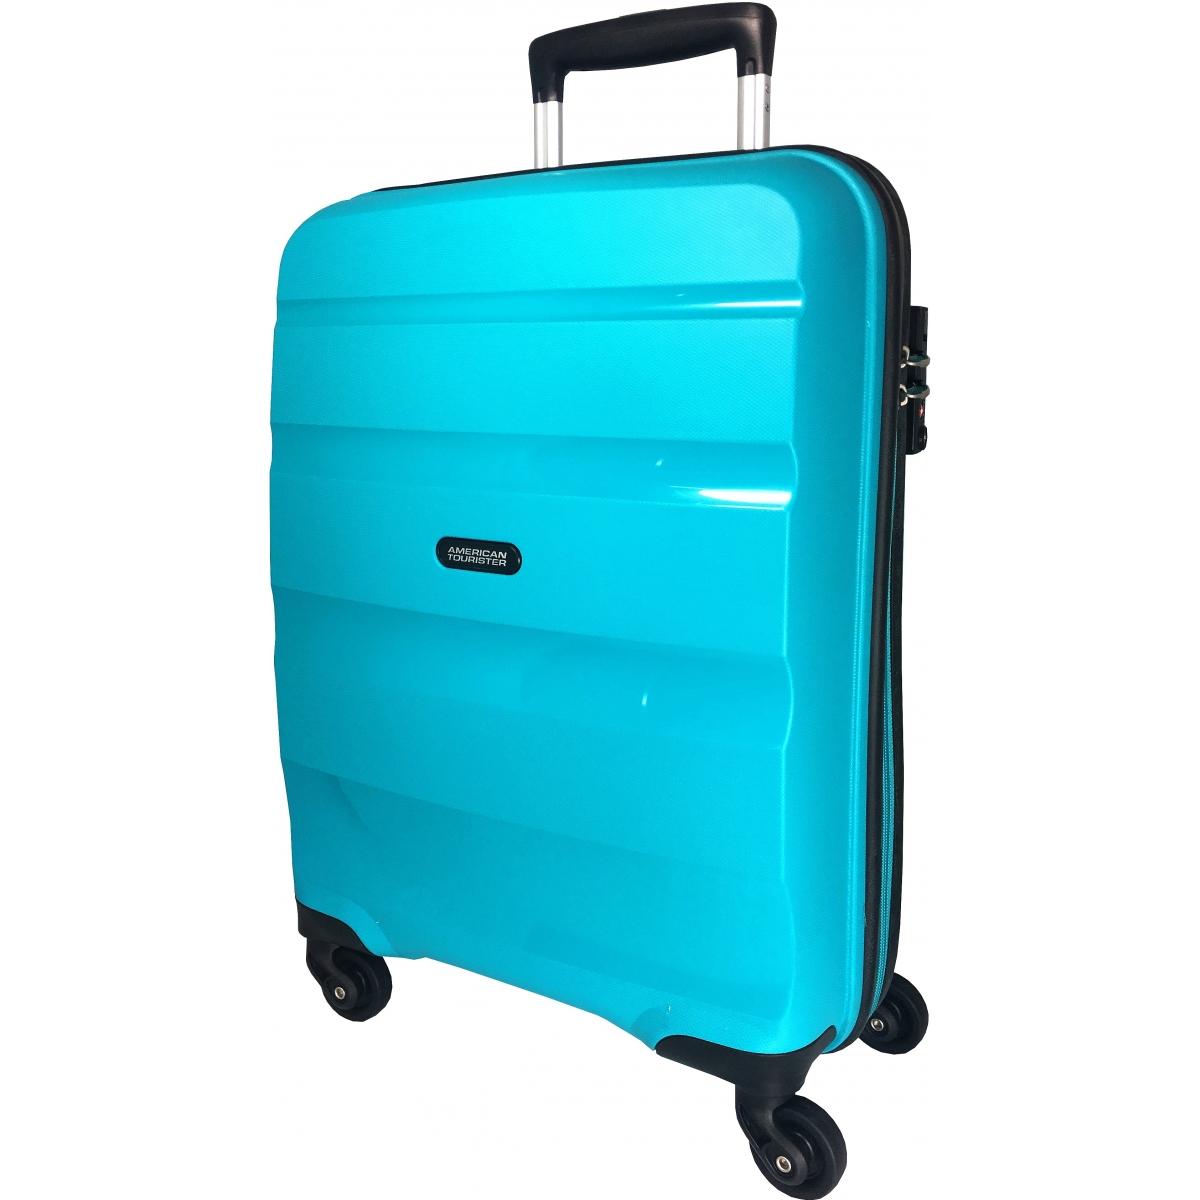 valise cabine bon air american tourister 55 cm turquoise bonair22 turquoise couleur. Black Bedroom Furniture Sets. Home Design Ideas